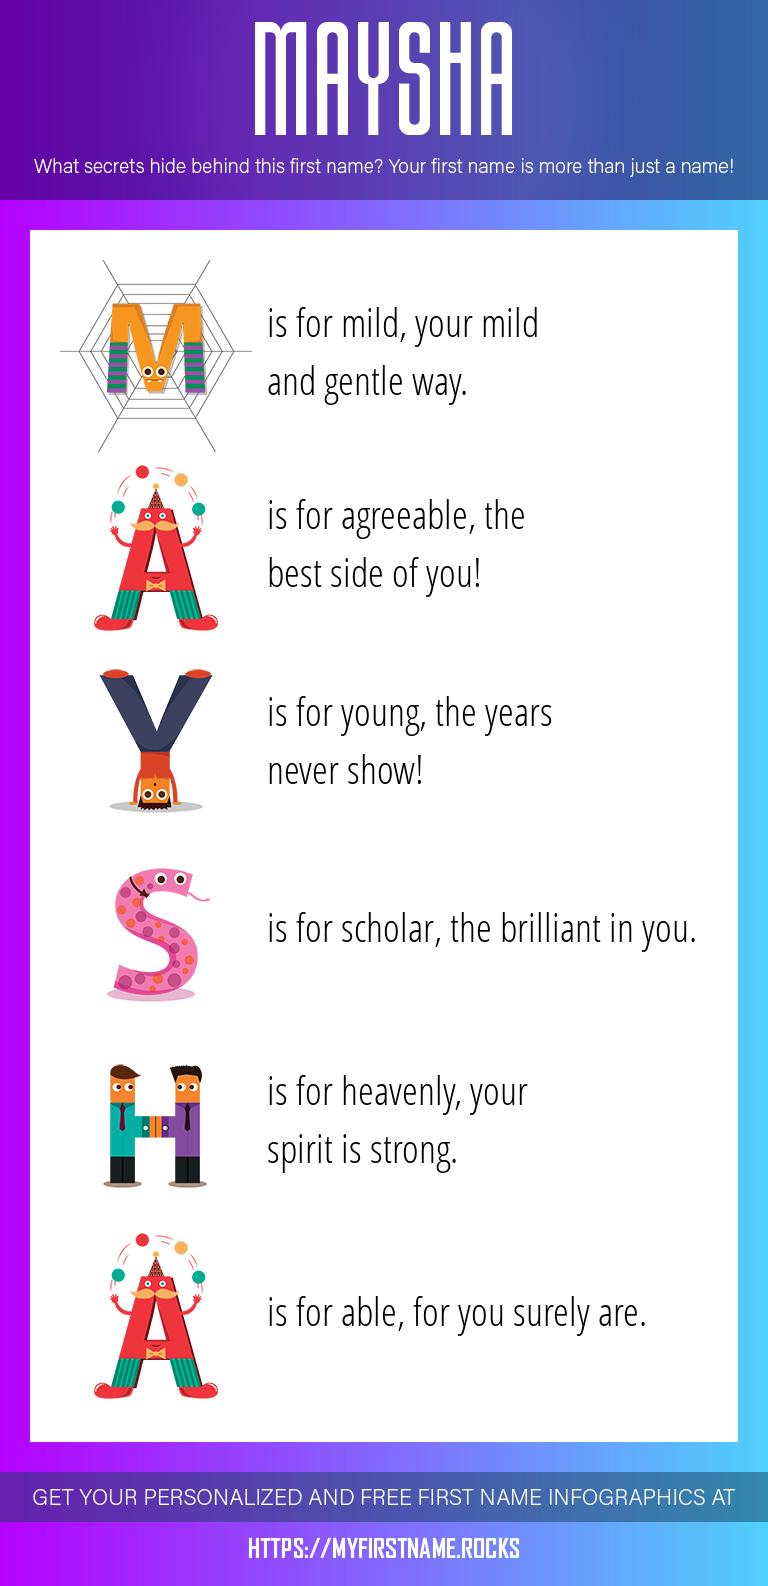 Maysha Infographics